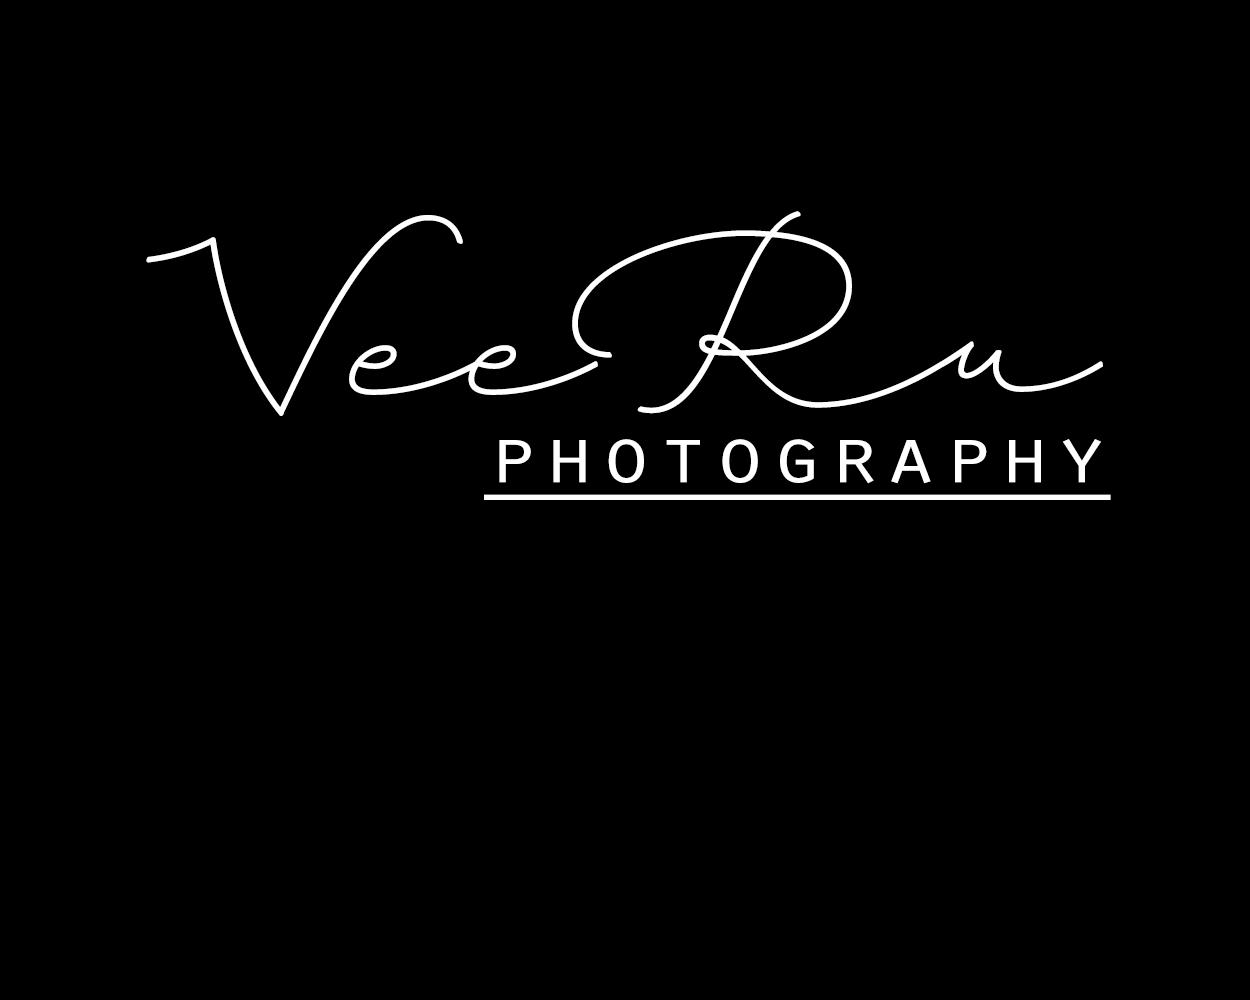 PhotoShop Cc - Photography Logo Create - VEERU EDITS